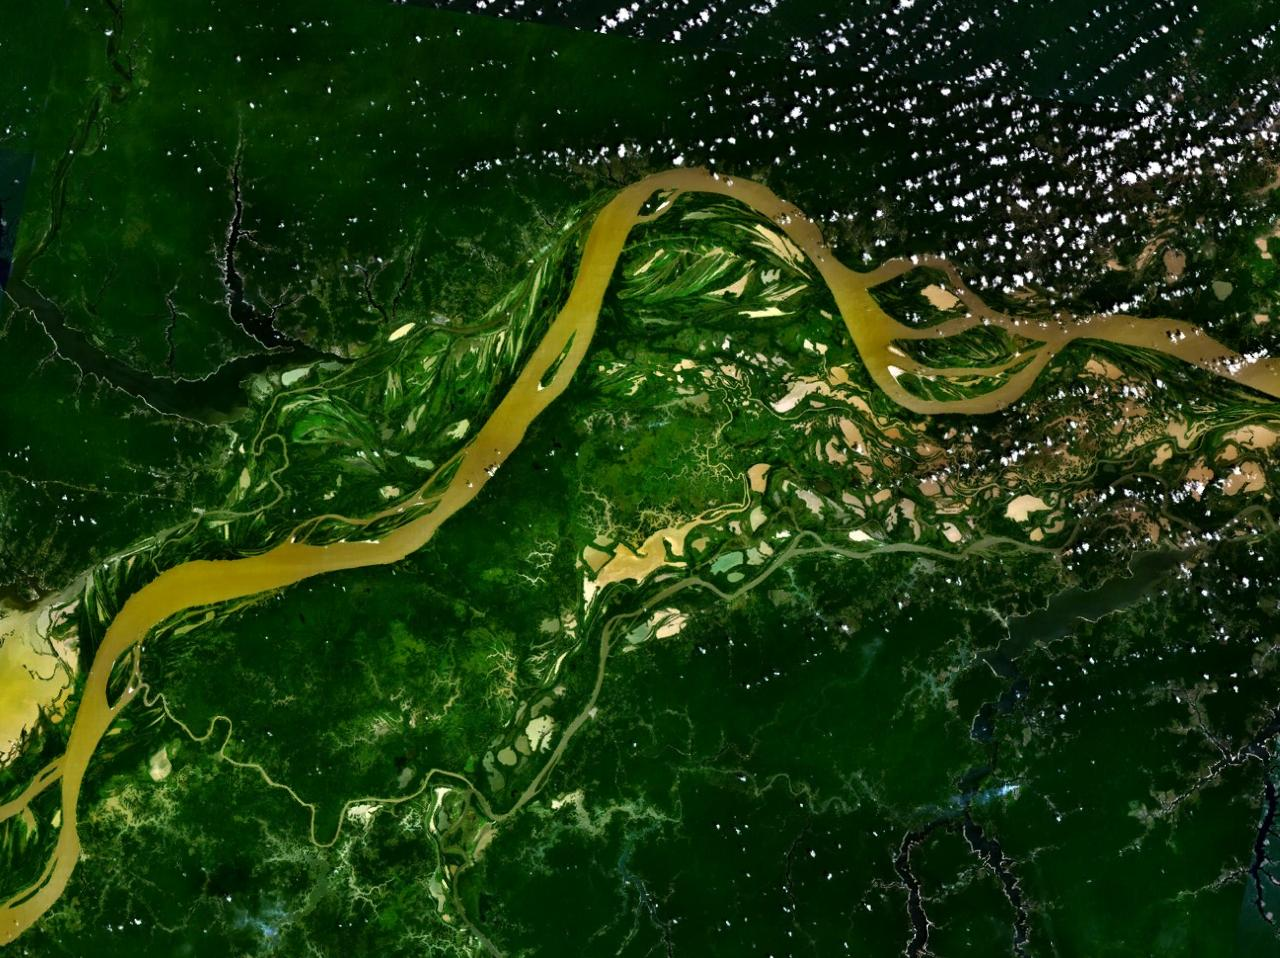 Река амазонка вид из космоса